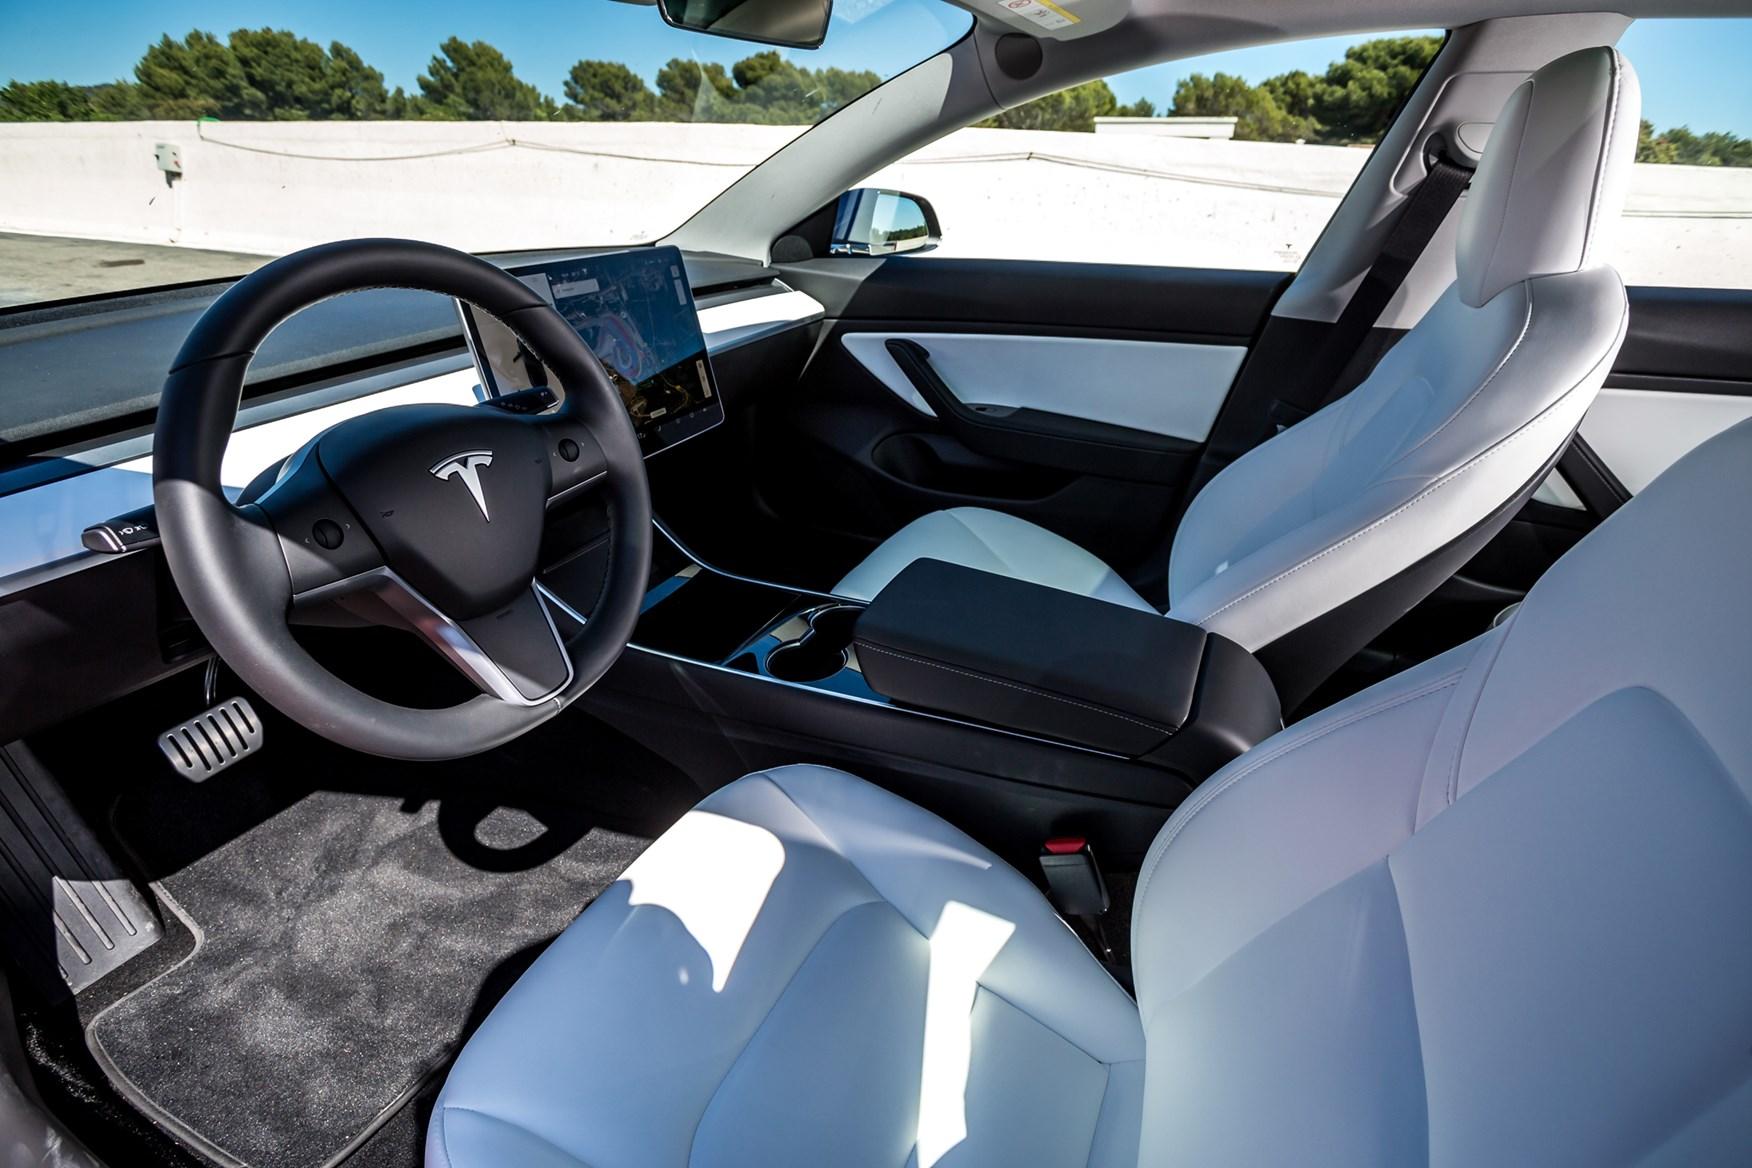 Tesla Model 3 (2019) Engines, Drive & Performance | Parkers